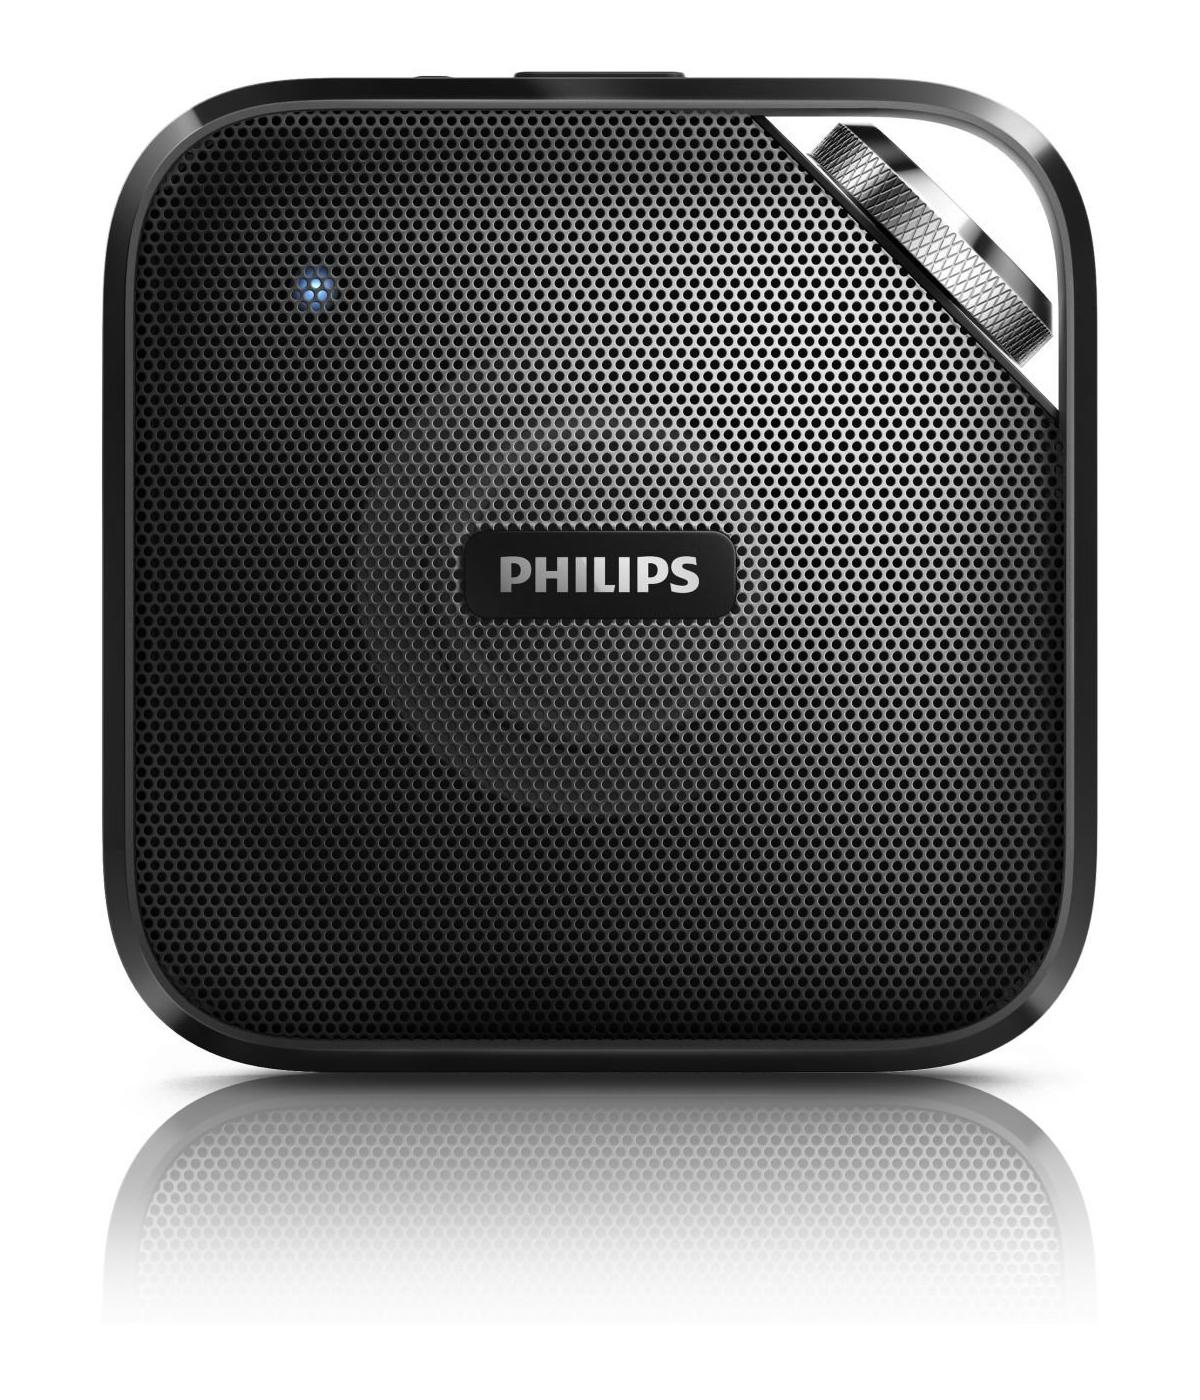 Philips-BT2500B-37-Wireless-Bluetooth1